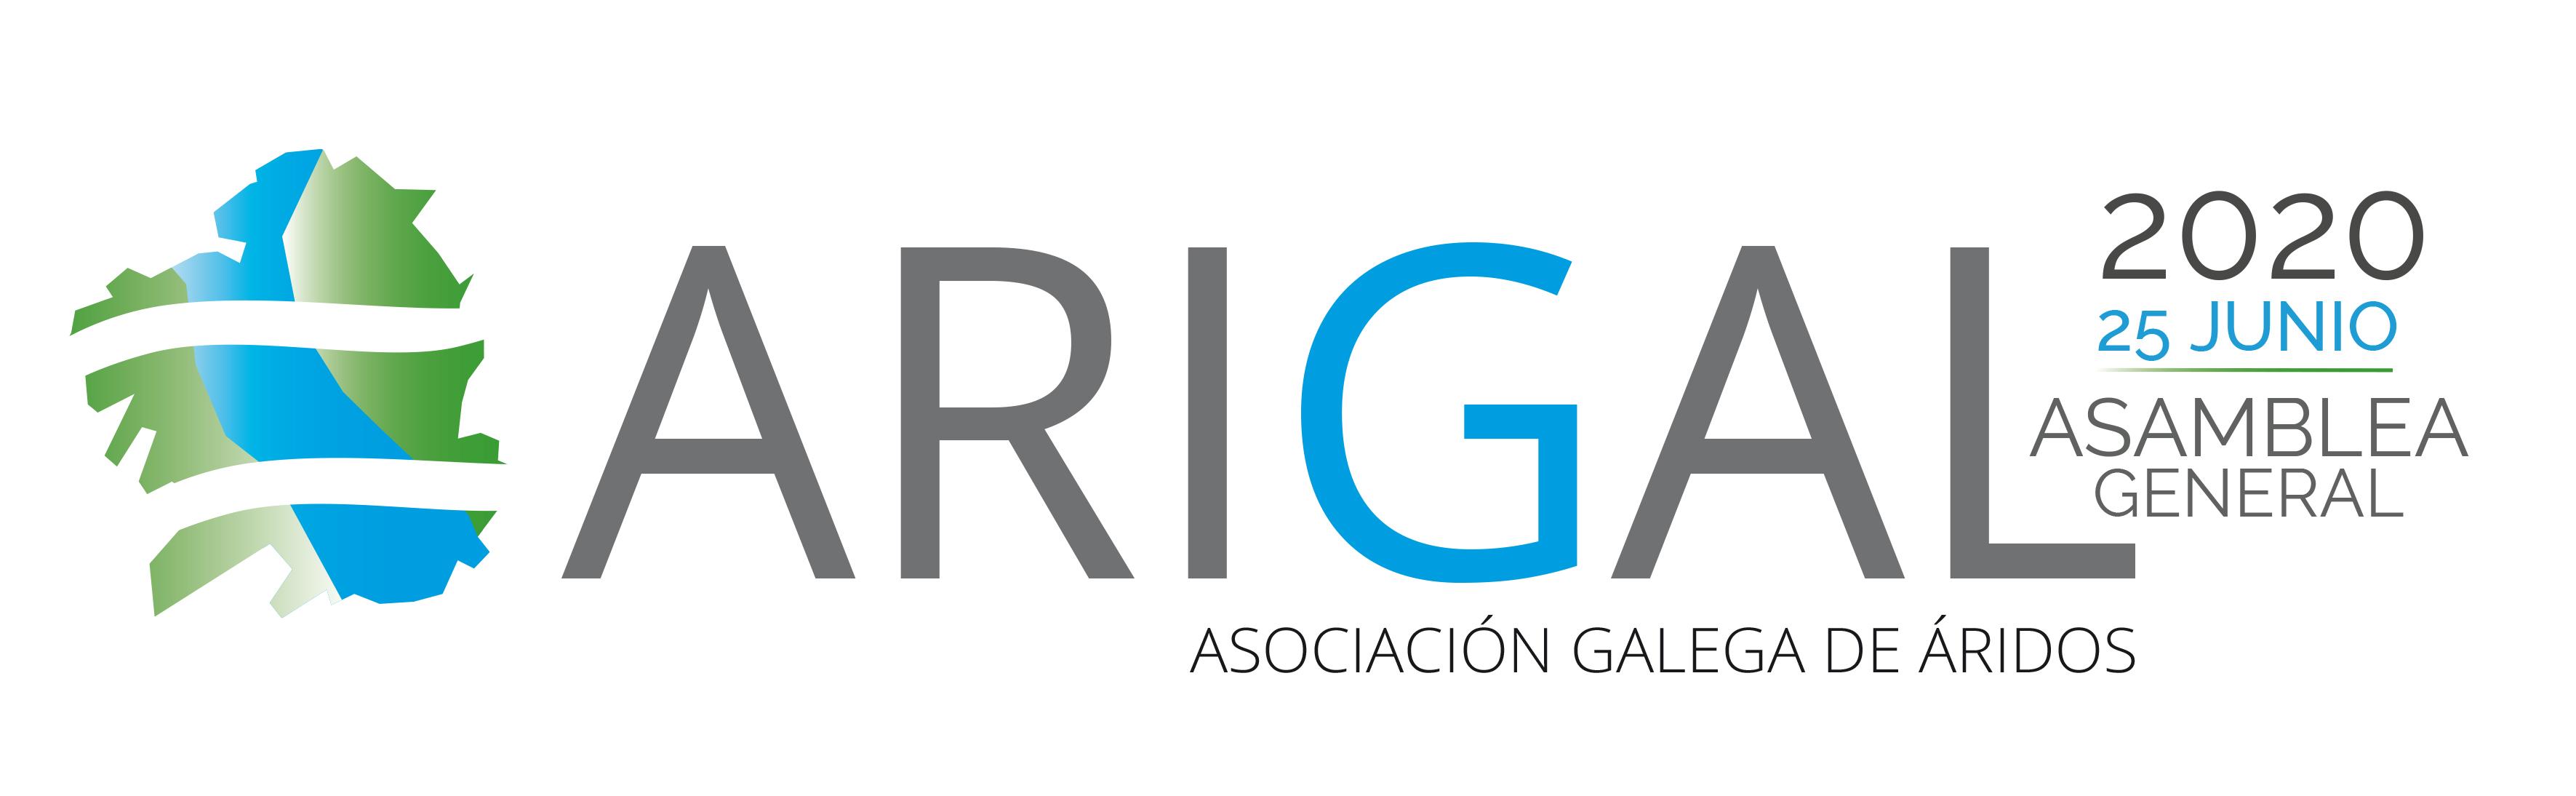 ARIGAL_LOGO_Asamblea-Gral-2020